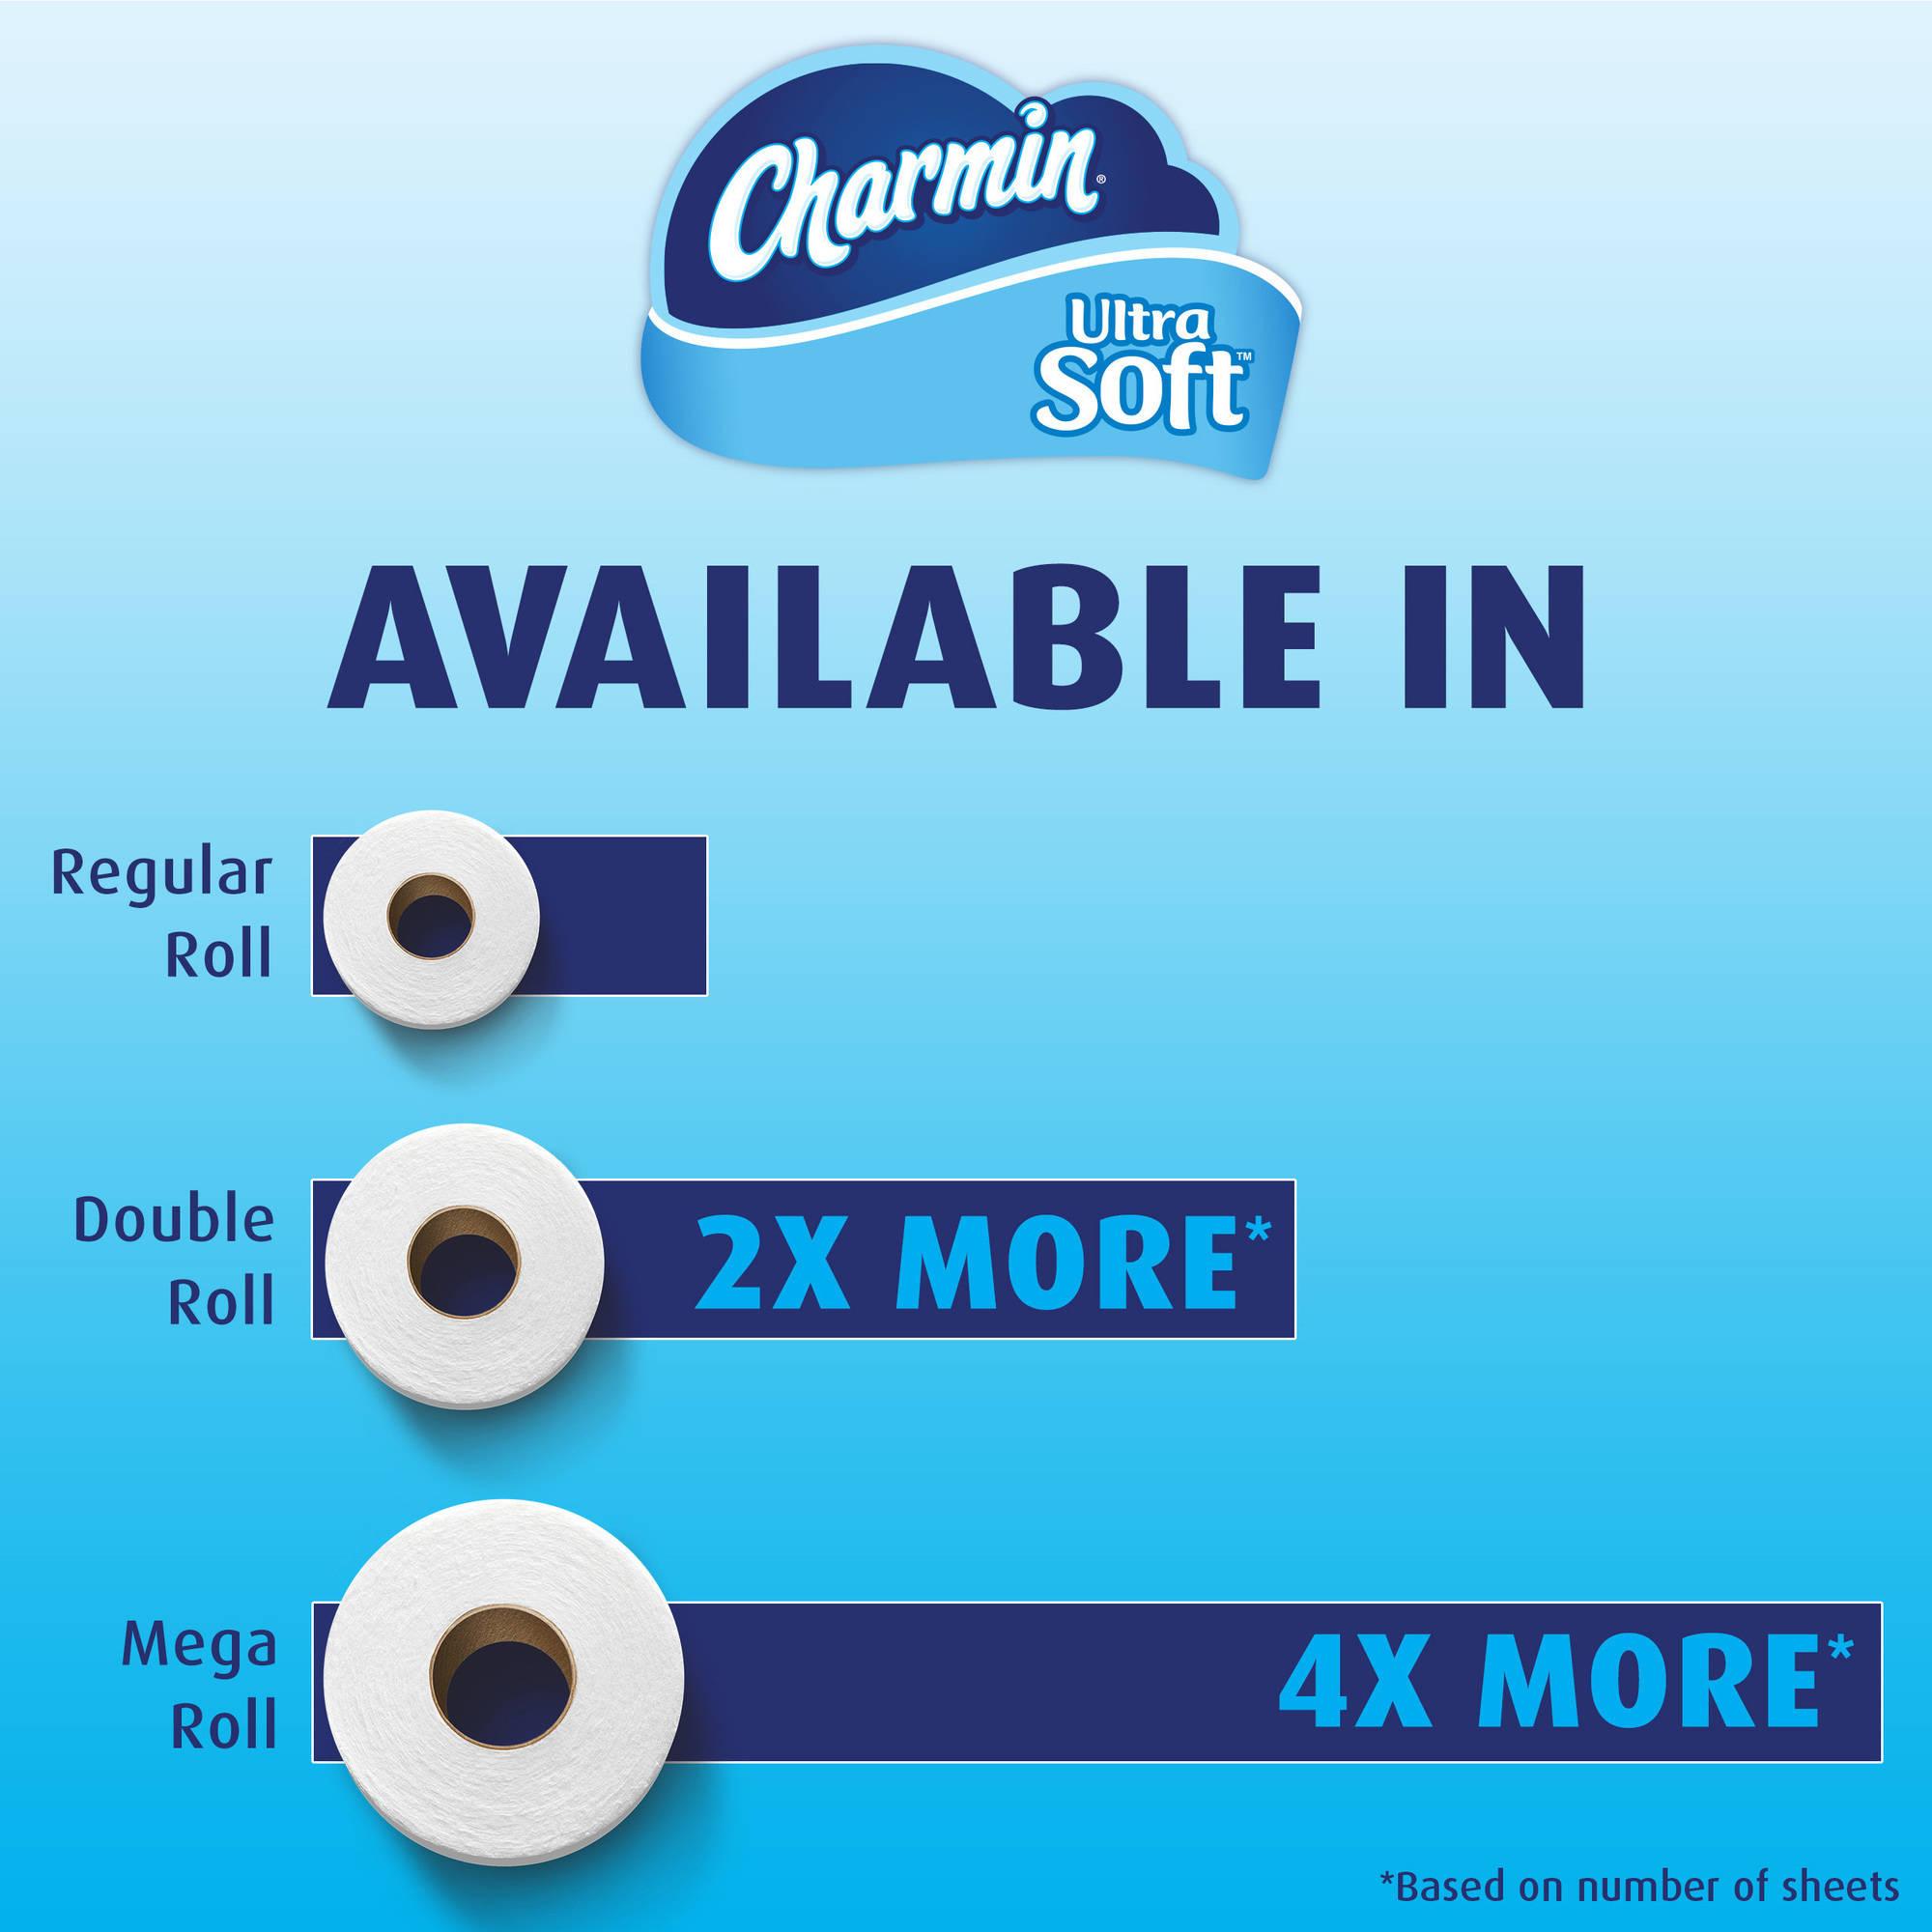 Charmin Ultra Soft Blue 9 Mega - Walmart.com